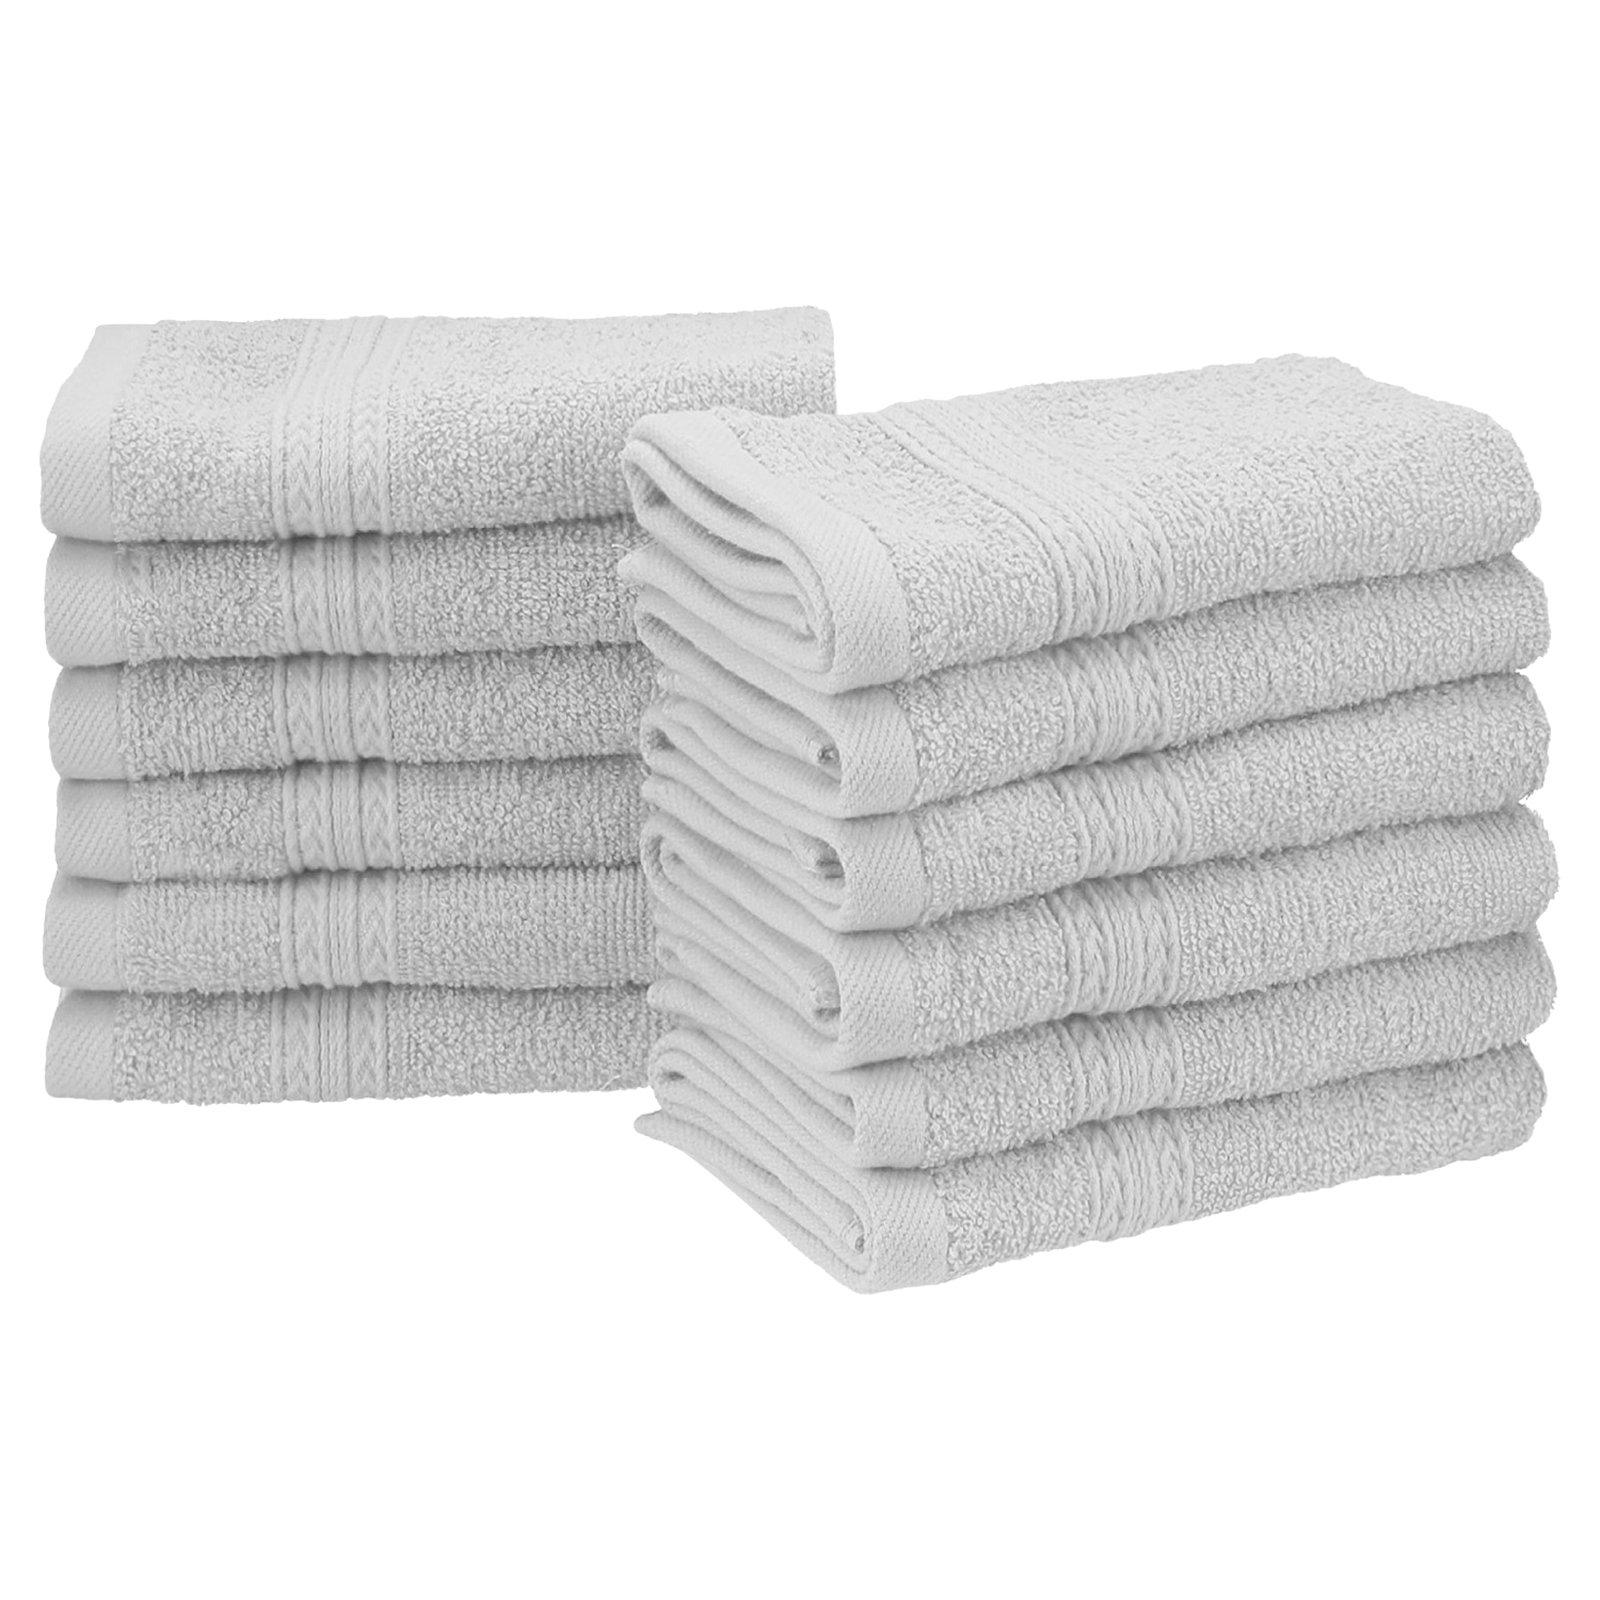 Superior Eco Friendly 100 Ringspun Cotton 12 Piece Face Towel Set